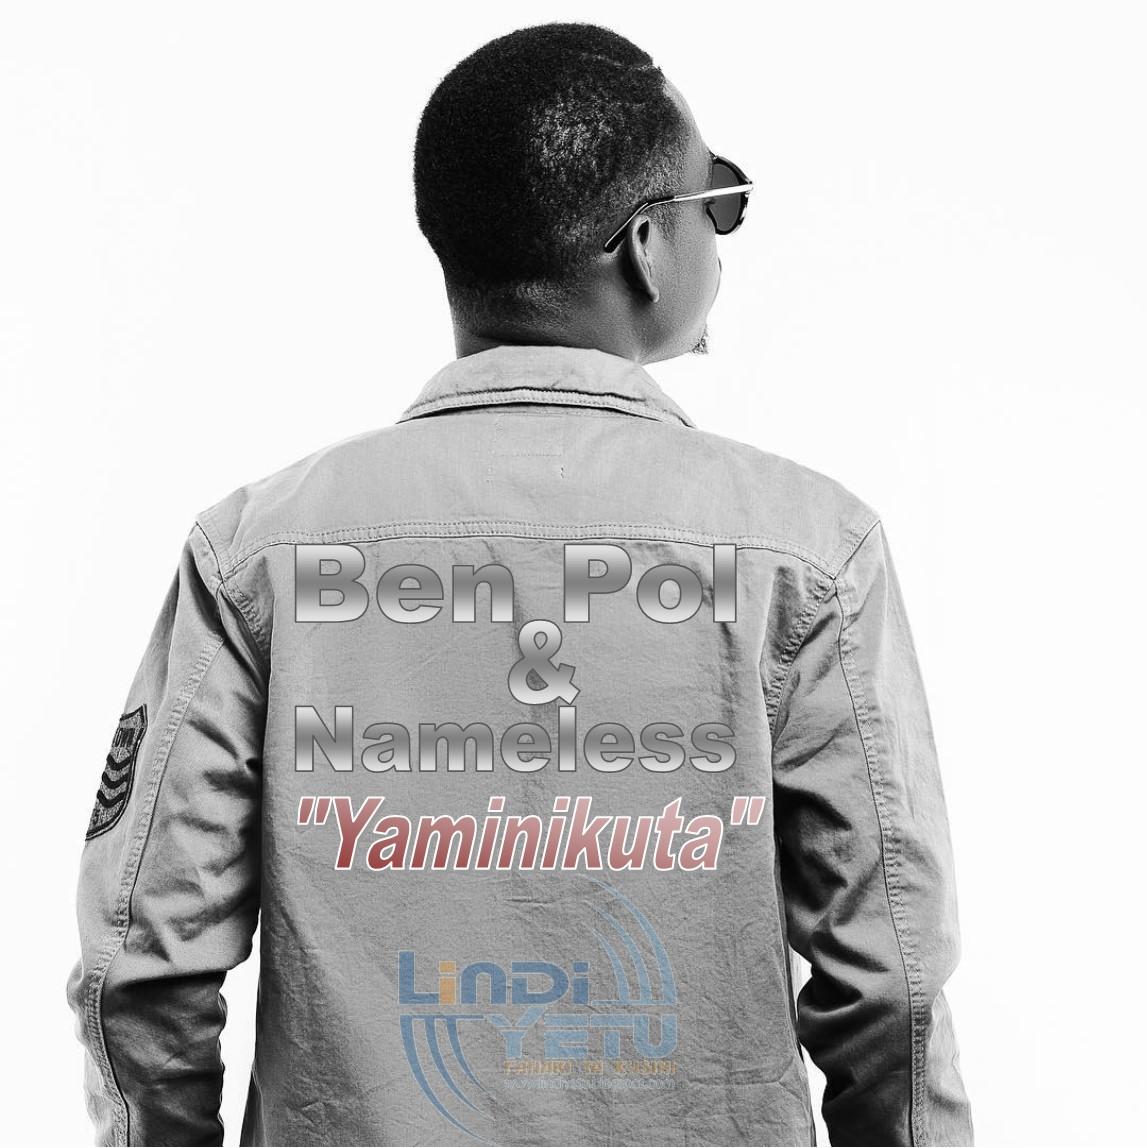 Ben Pol & Nameless - Yamenikuta